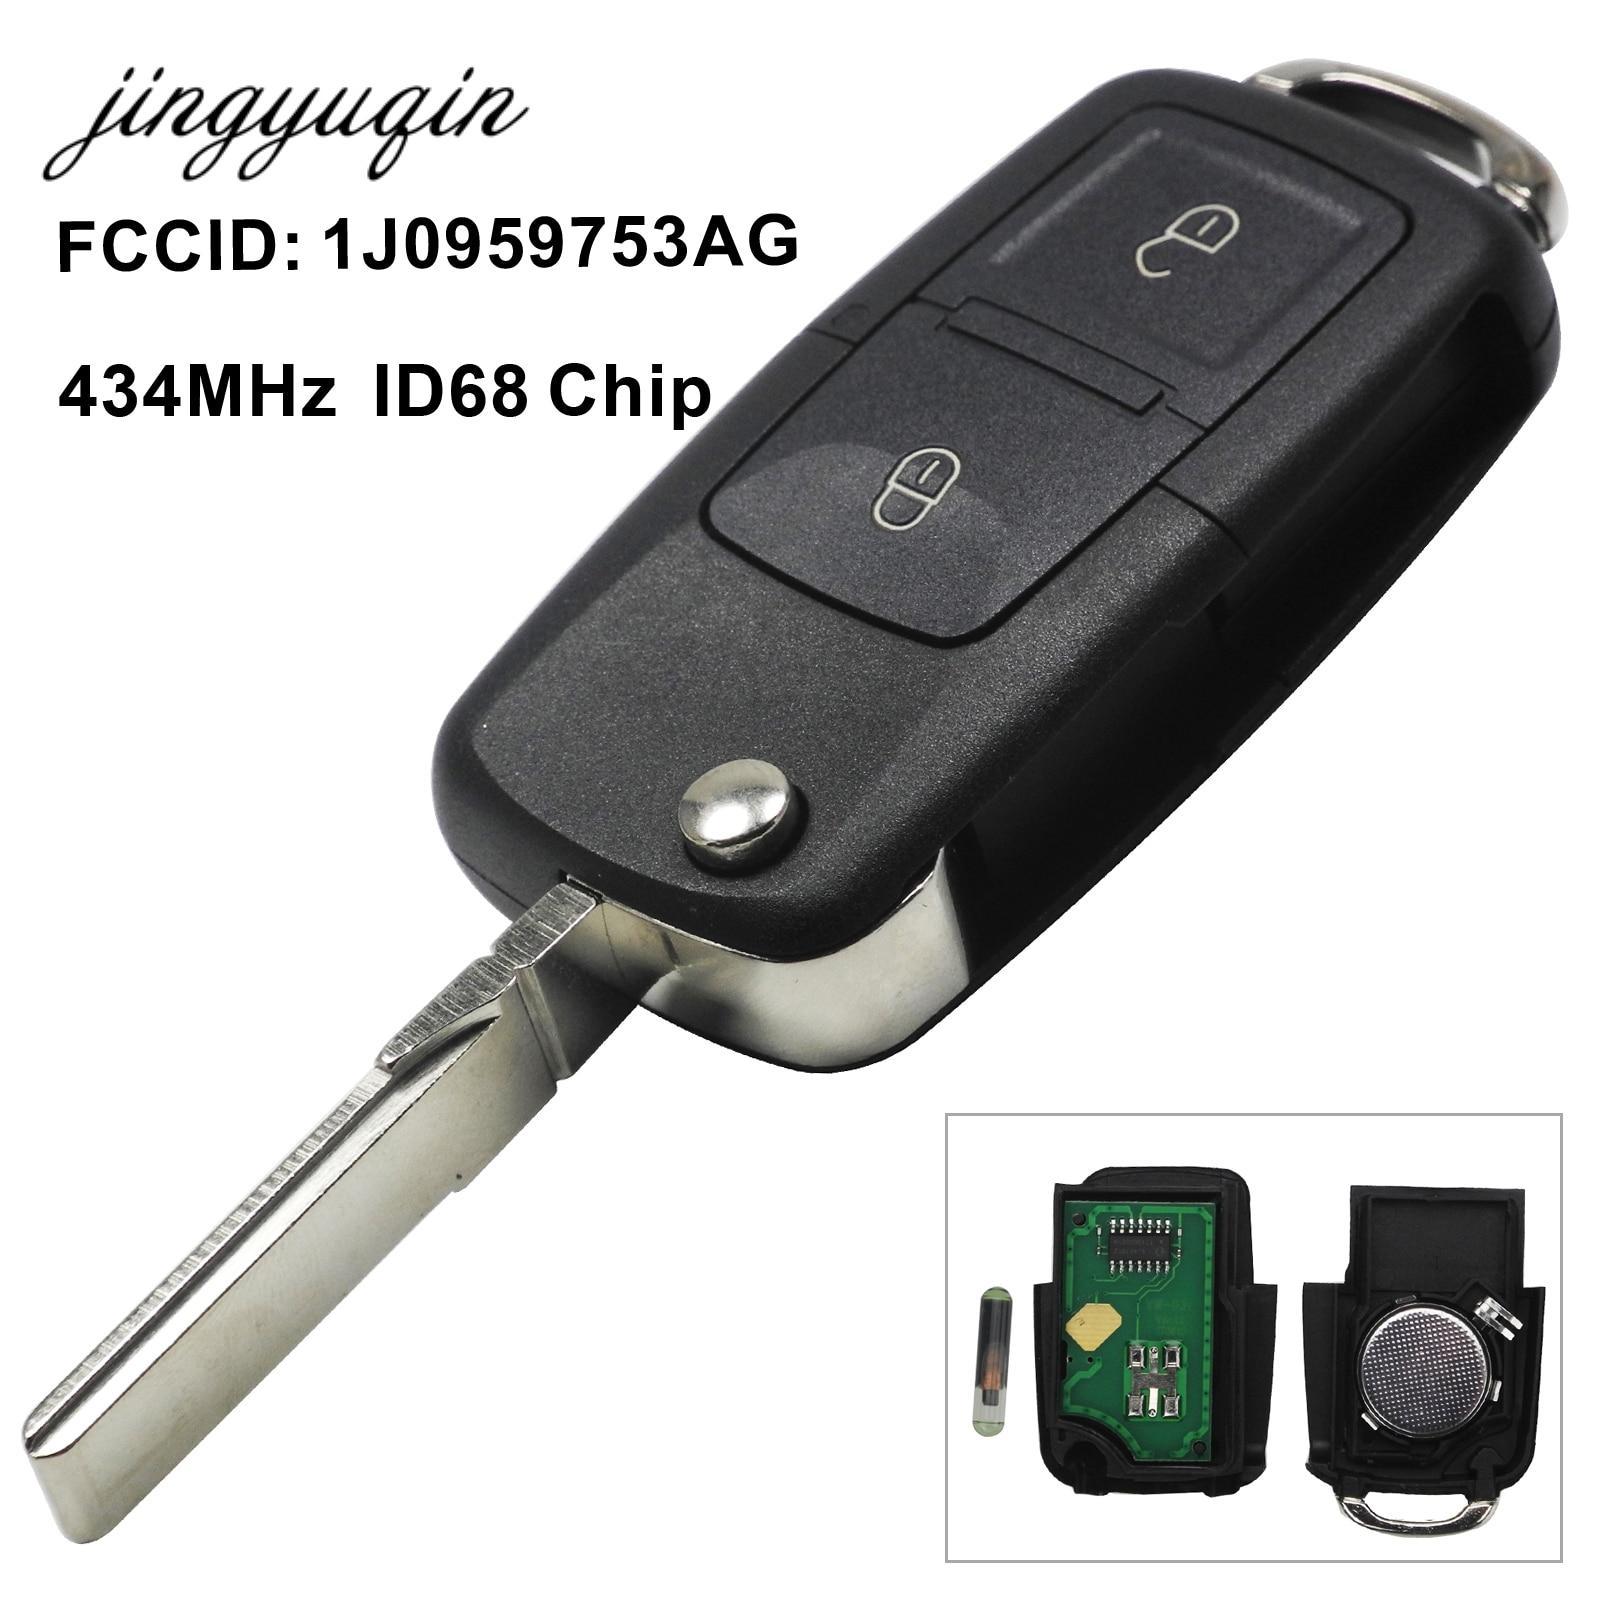 jingyuqin 2/3/4 Button Flip Remote Key Fob 434MHz ID48 Chip For VW Beetle Bora Golf Passat Polo Transporter T5 1J0 959 753 AG